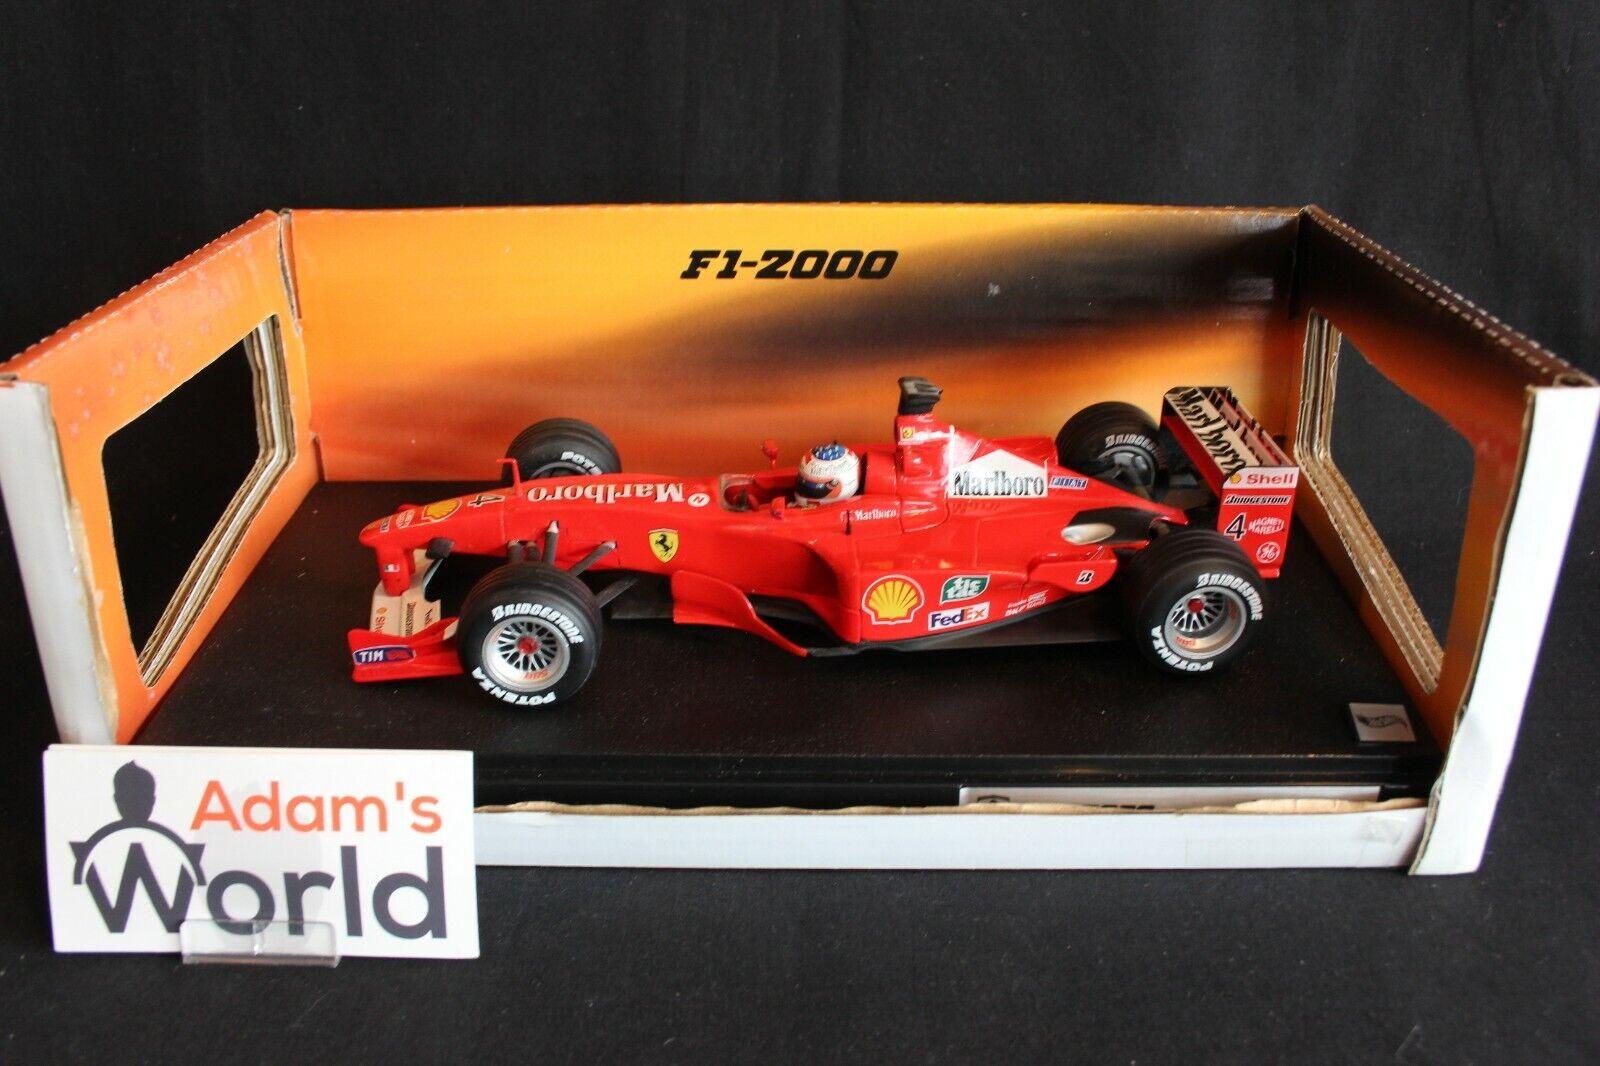 Hot Wheels Ferrari F-2000 2000 1 18  4 Rubens Barrichello  Marlboro  (PJBB)